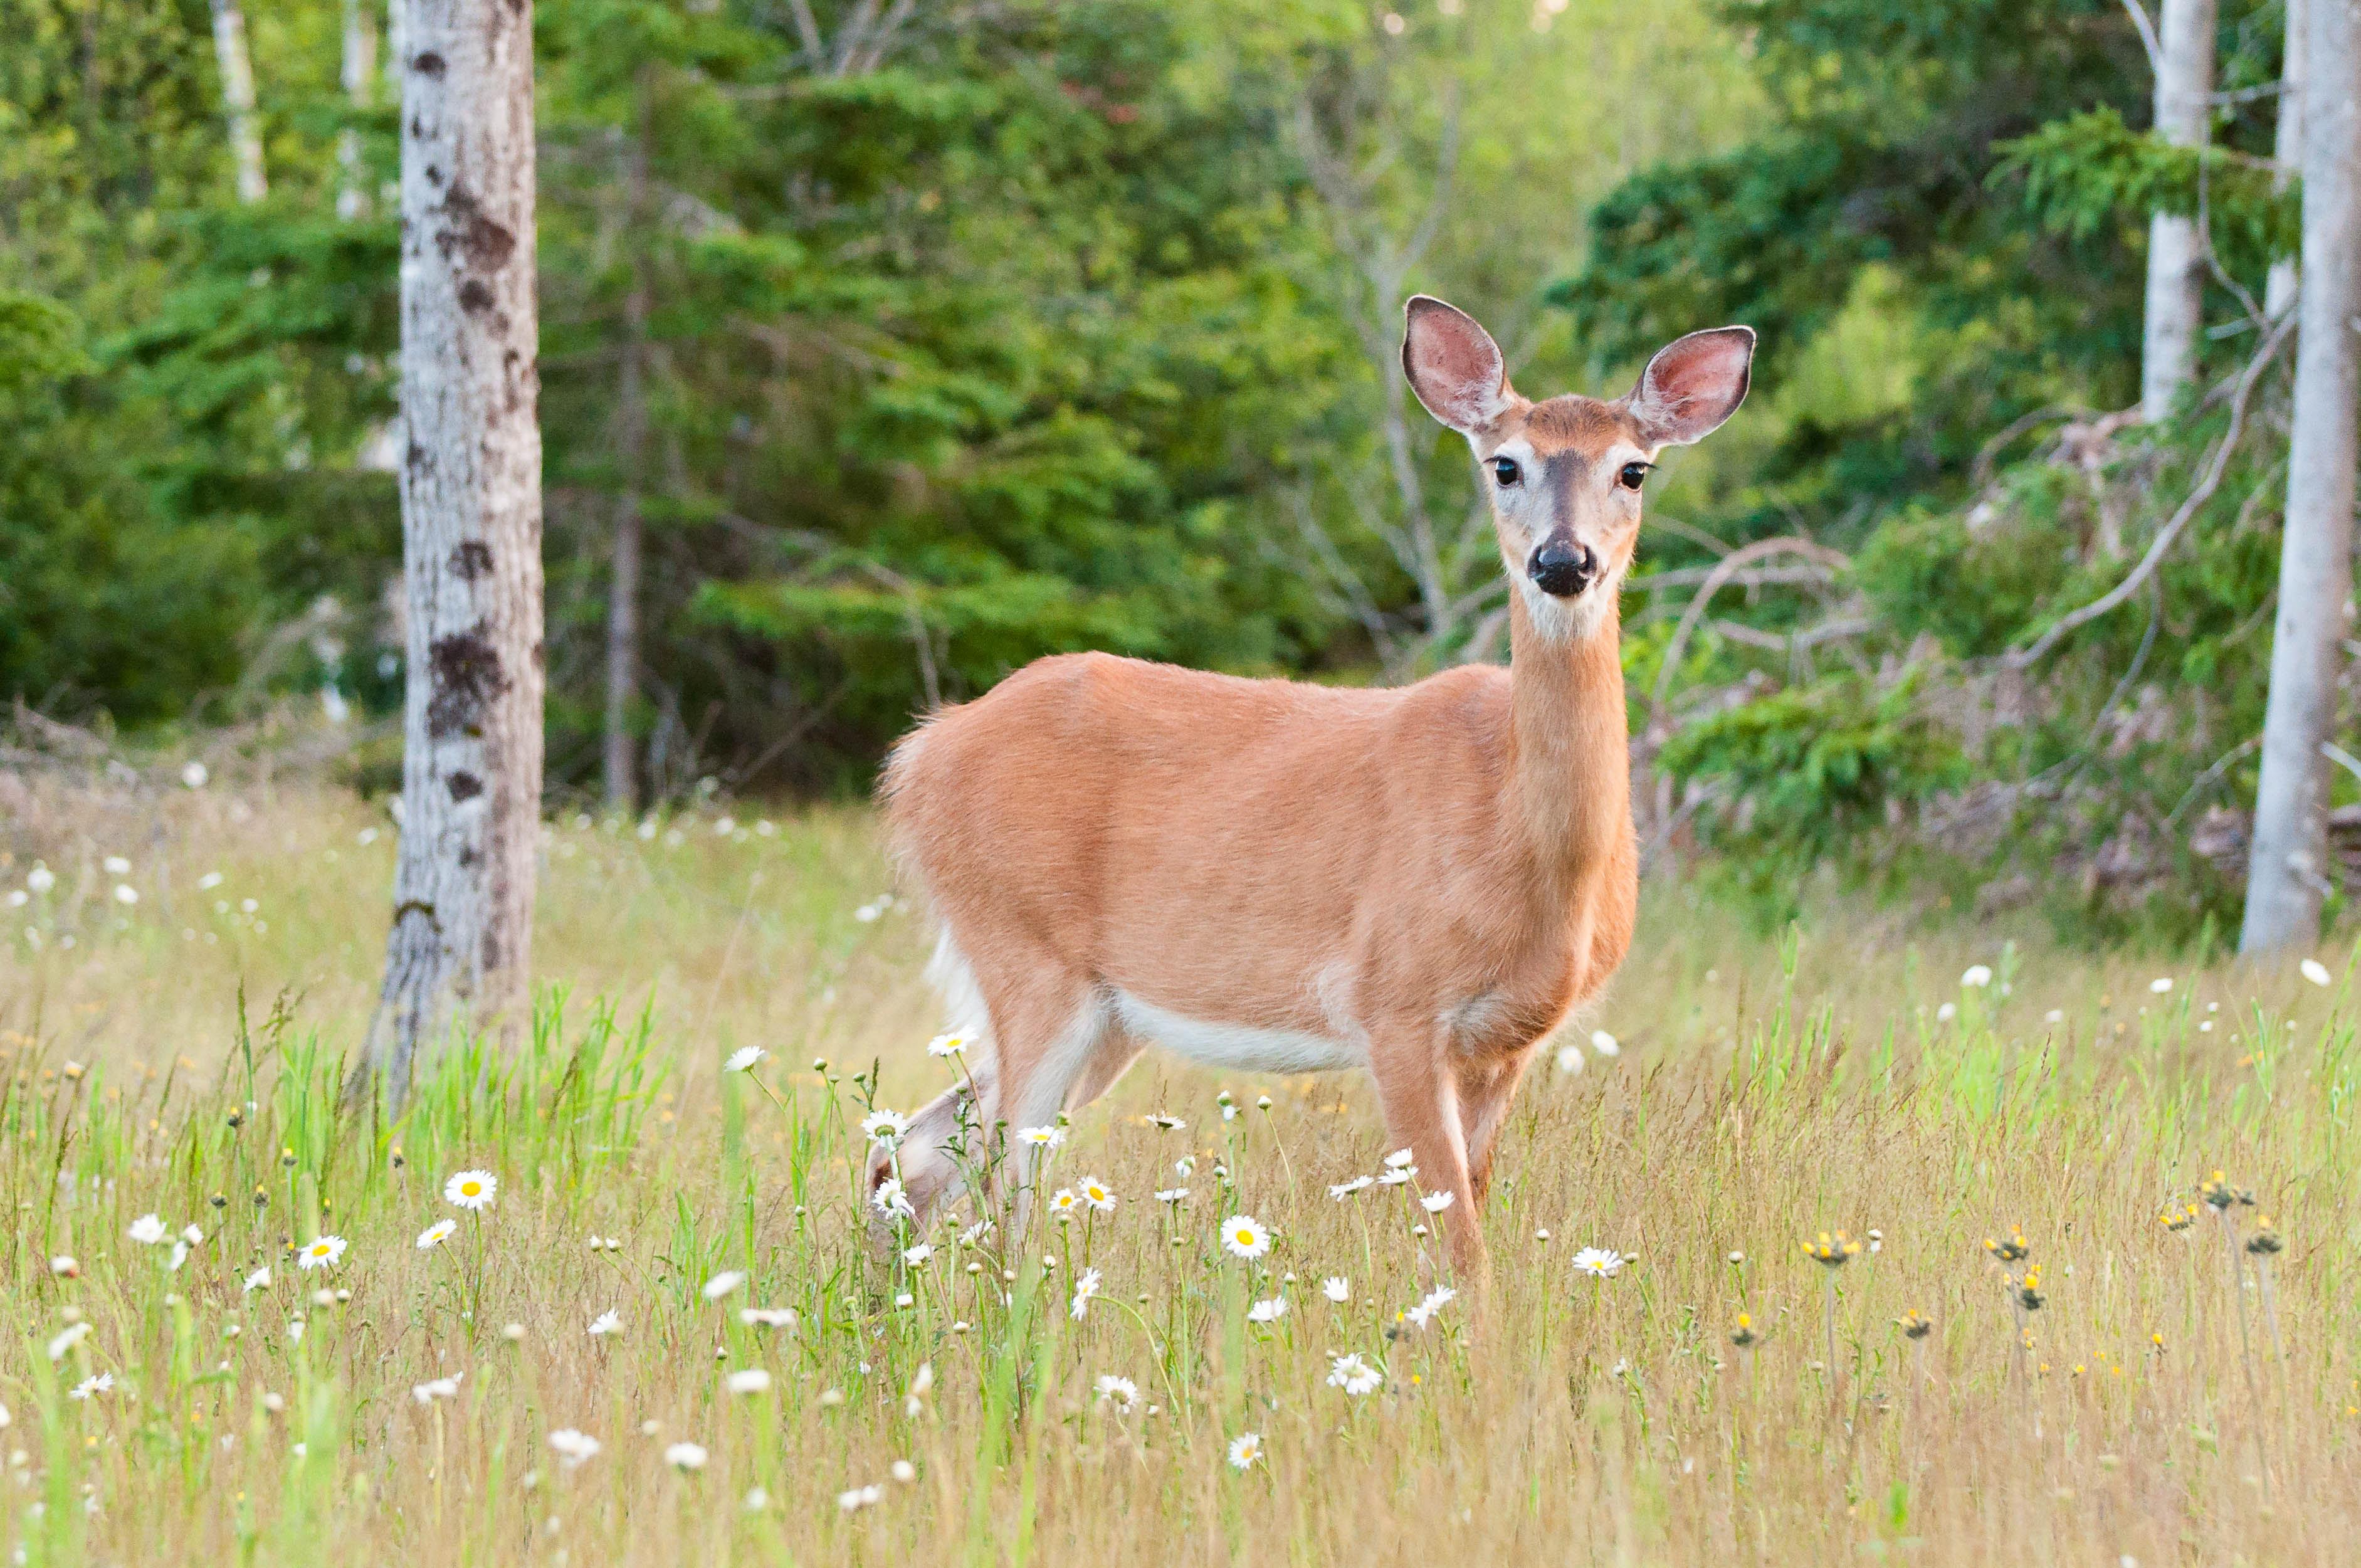 A deadly deer disease is spreading. Could it strike people, too?